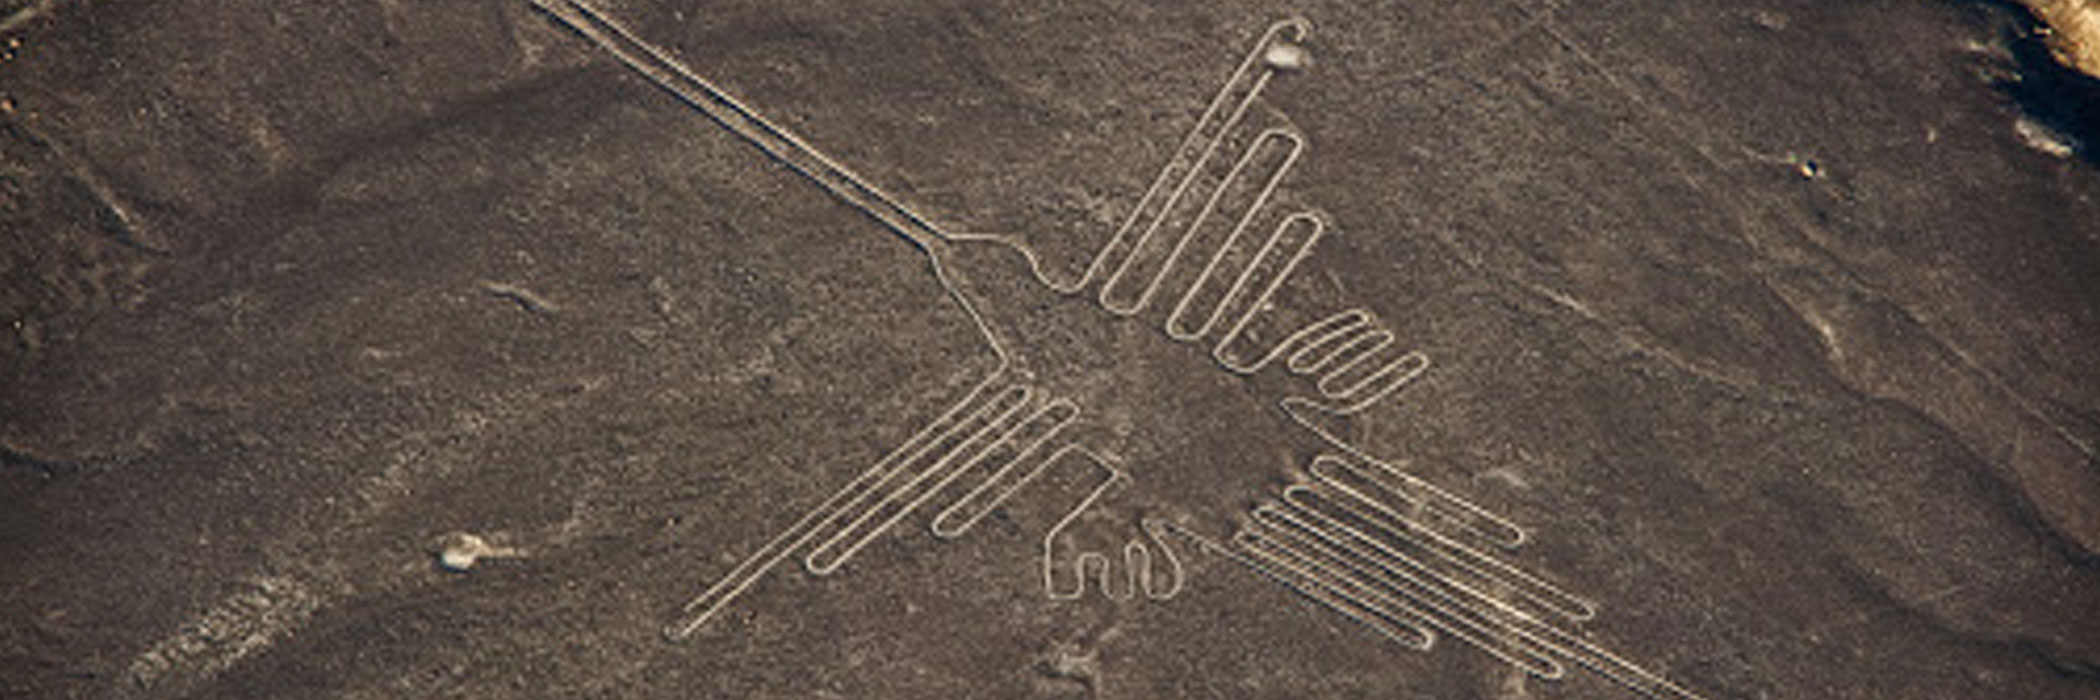 nazca lines travel machu picchu 8 days (1)